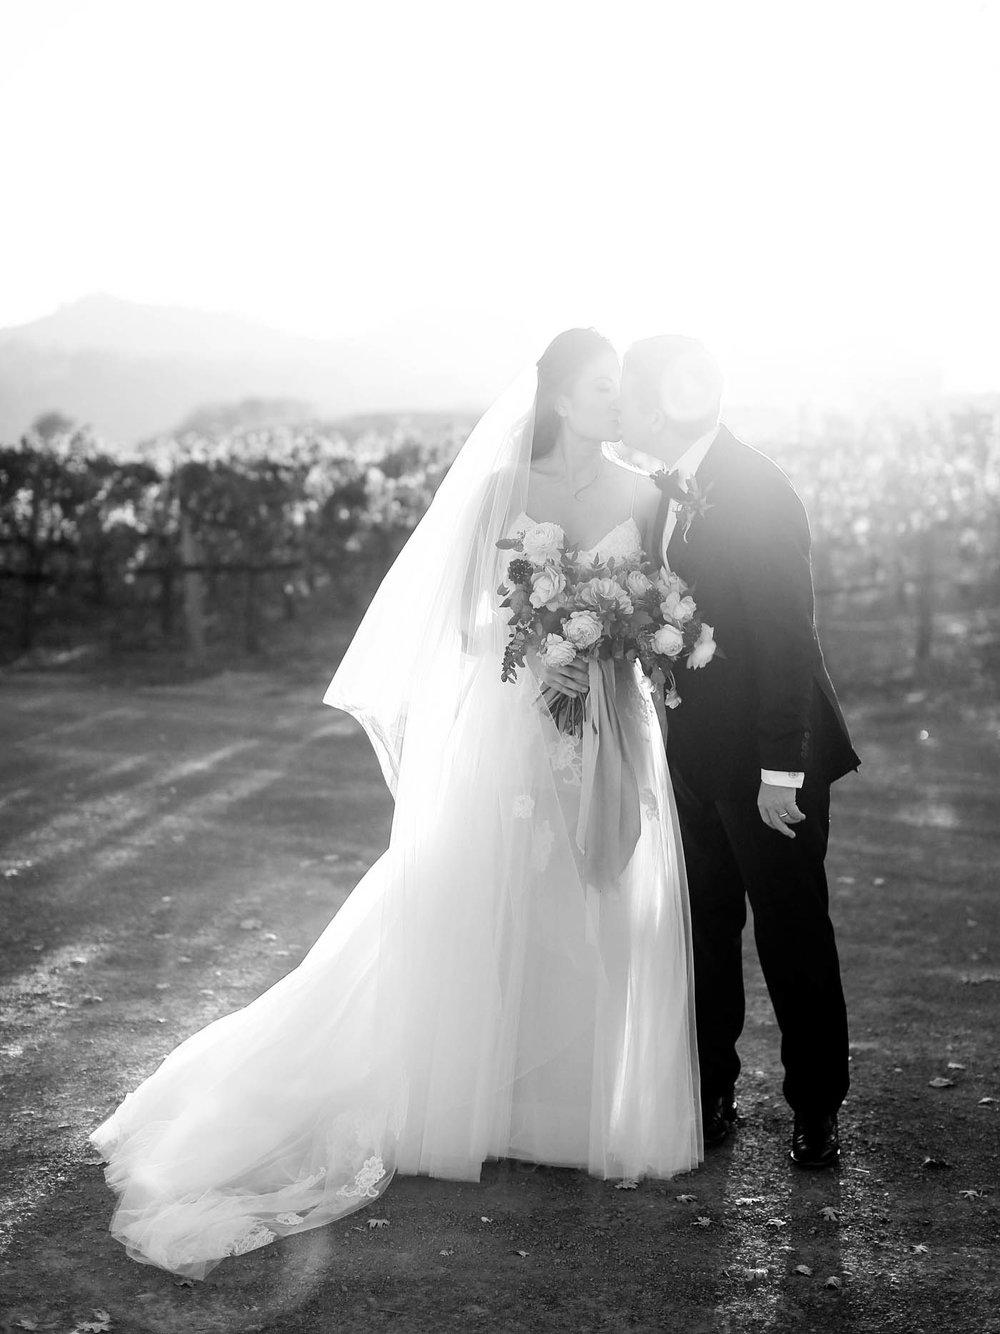 sunstone-villa-wedding-21-Jen_Huang-RD-98-Jen_Huang-JHP_4096.jpg